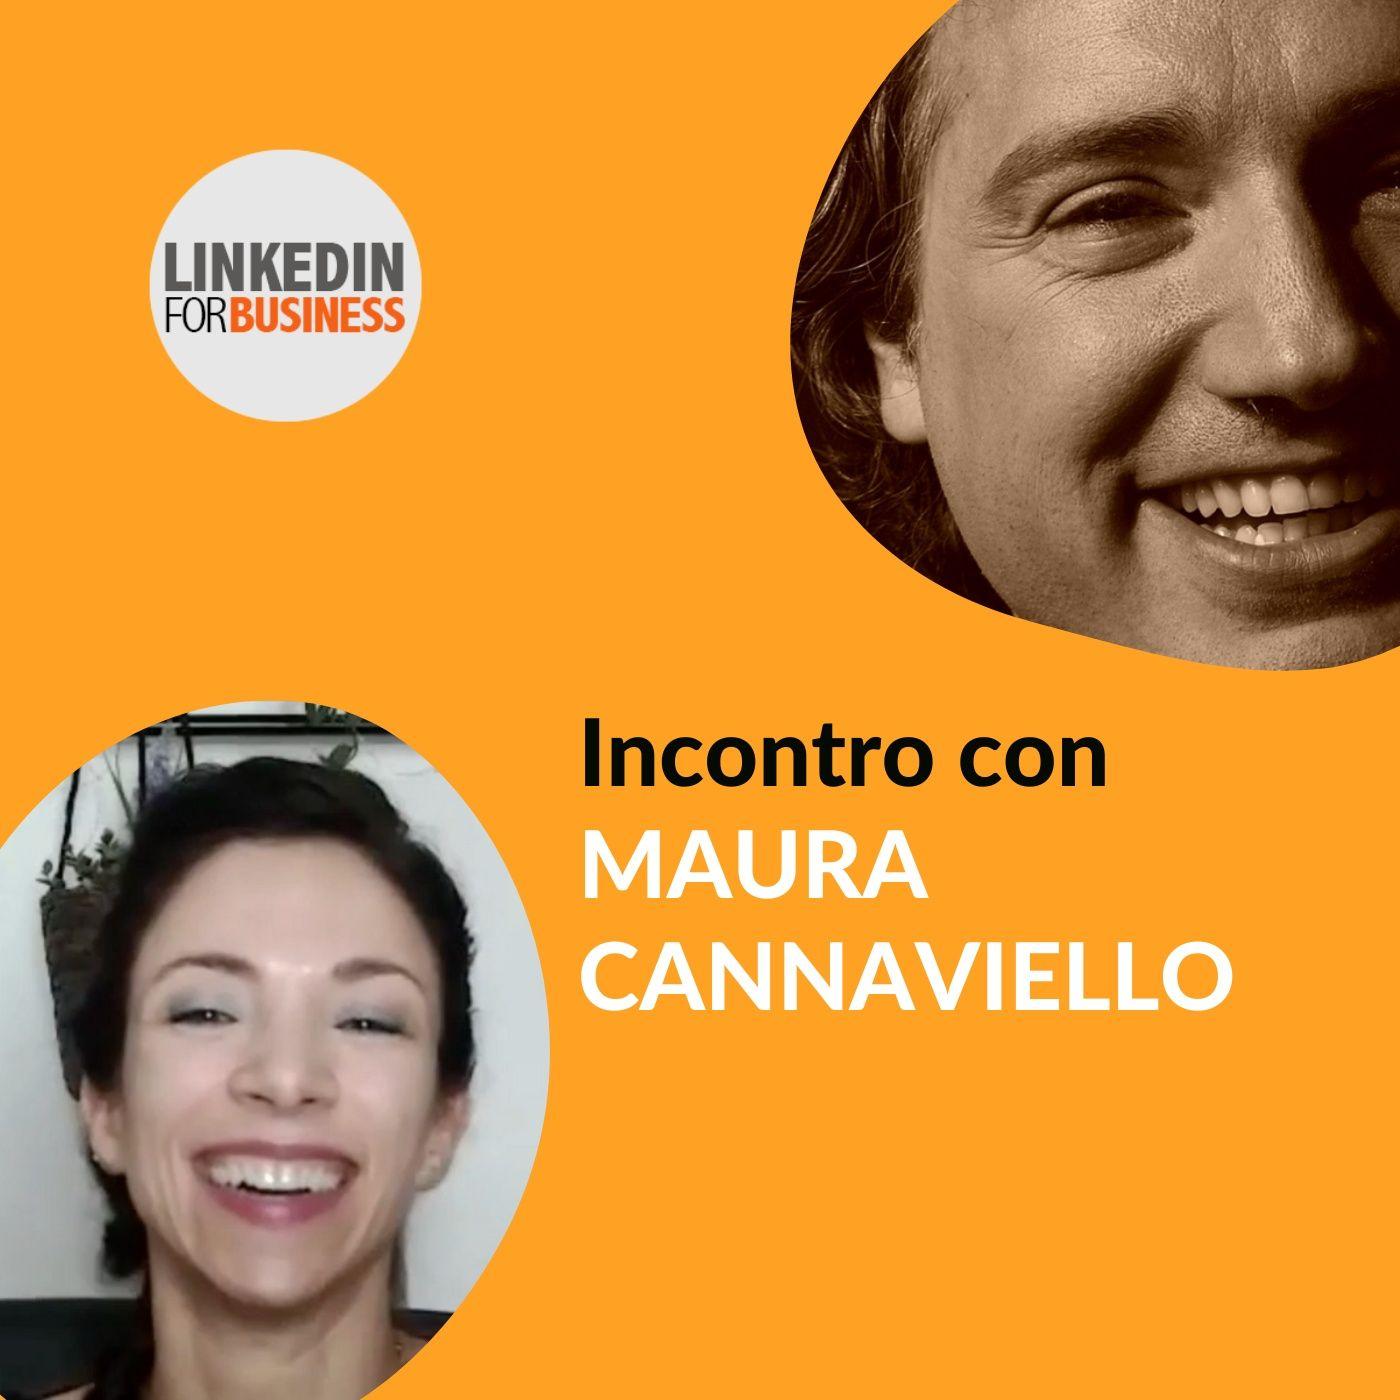 126 - LinkedInForBusiness incontra Maura Cannaviello